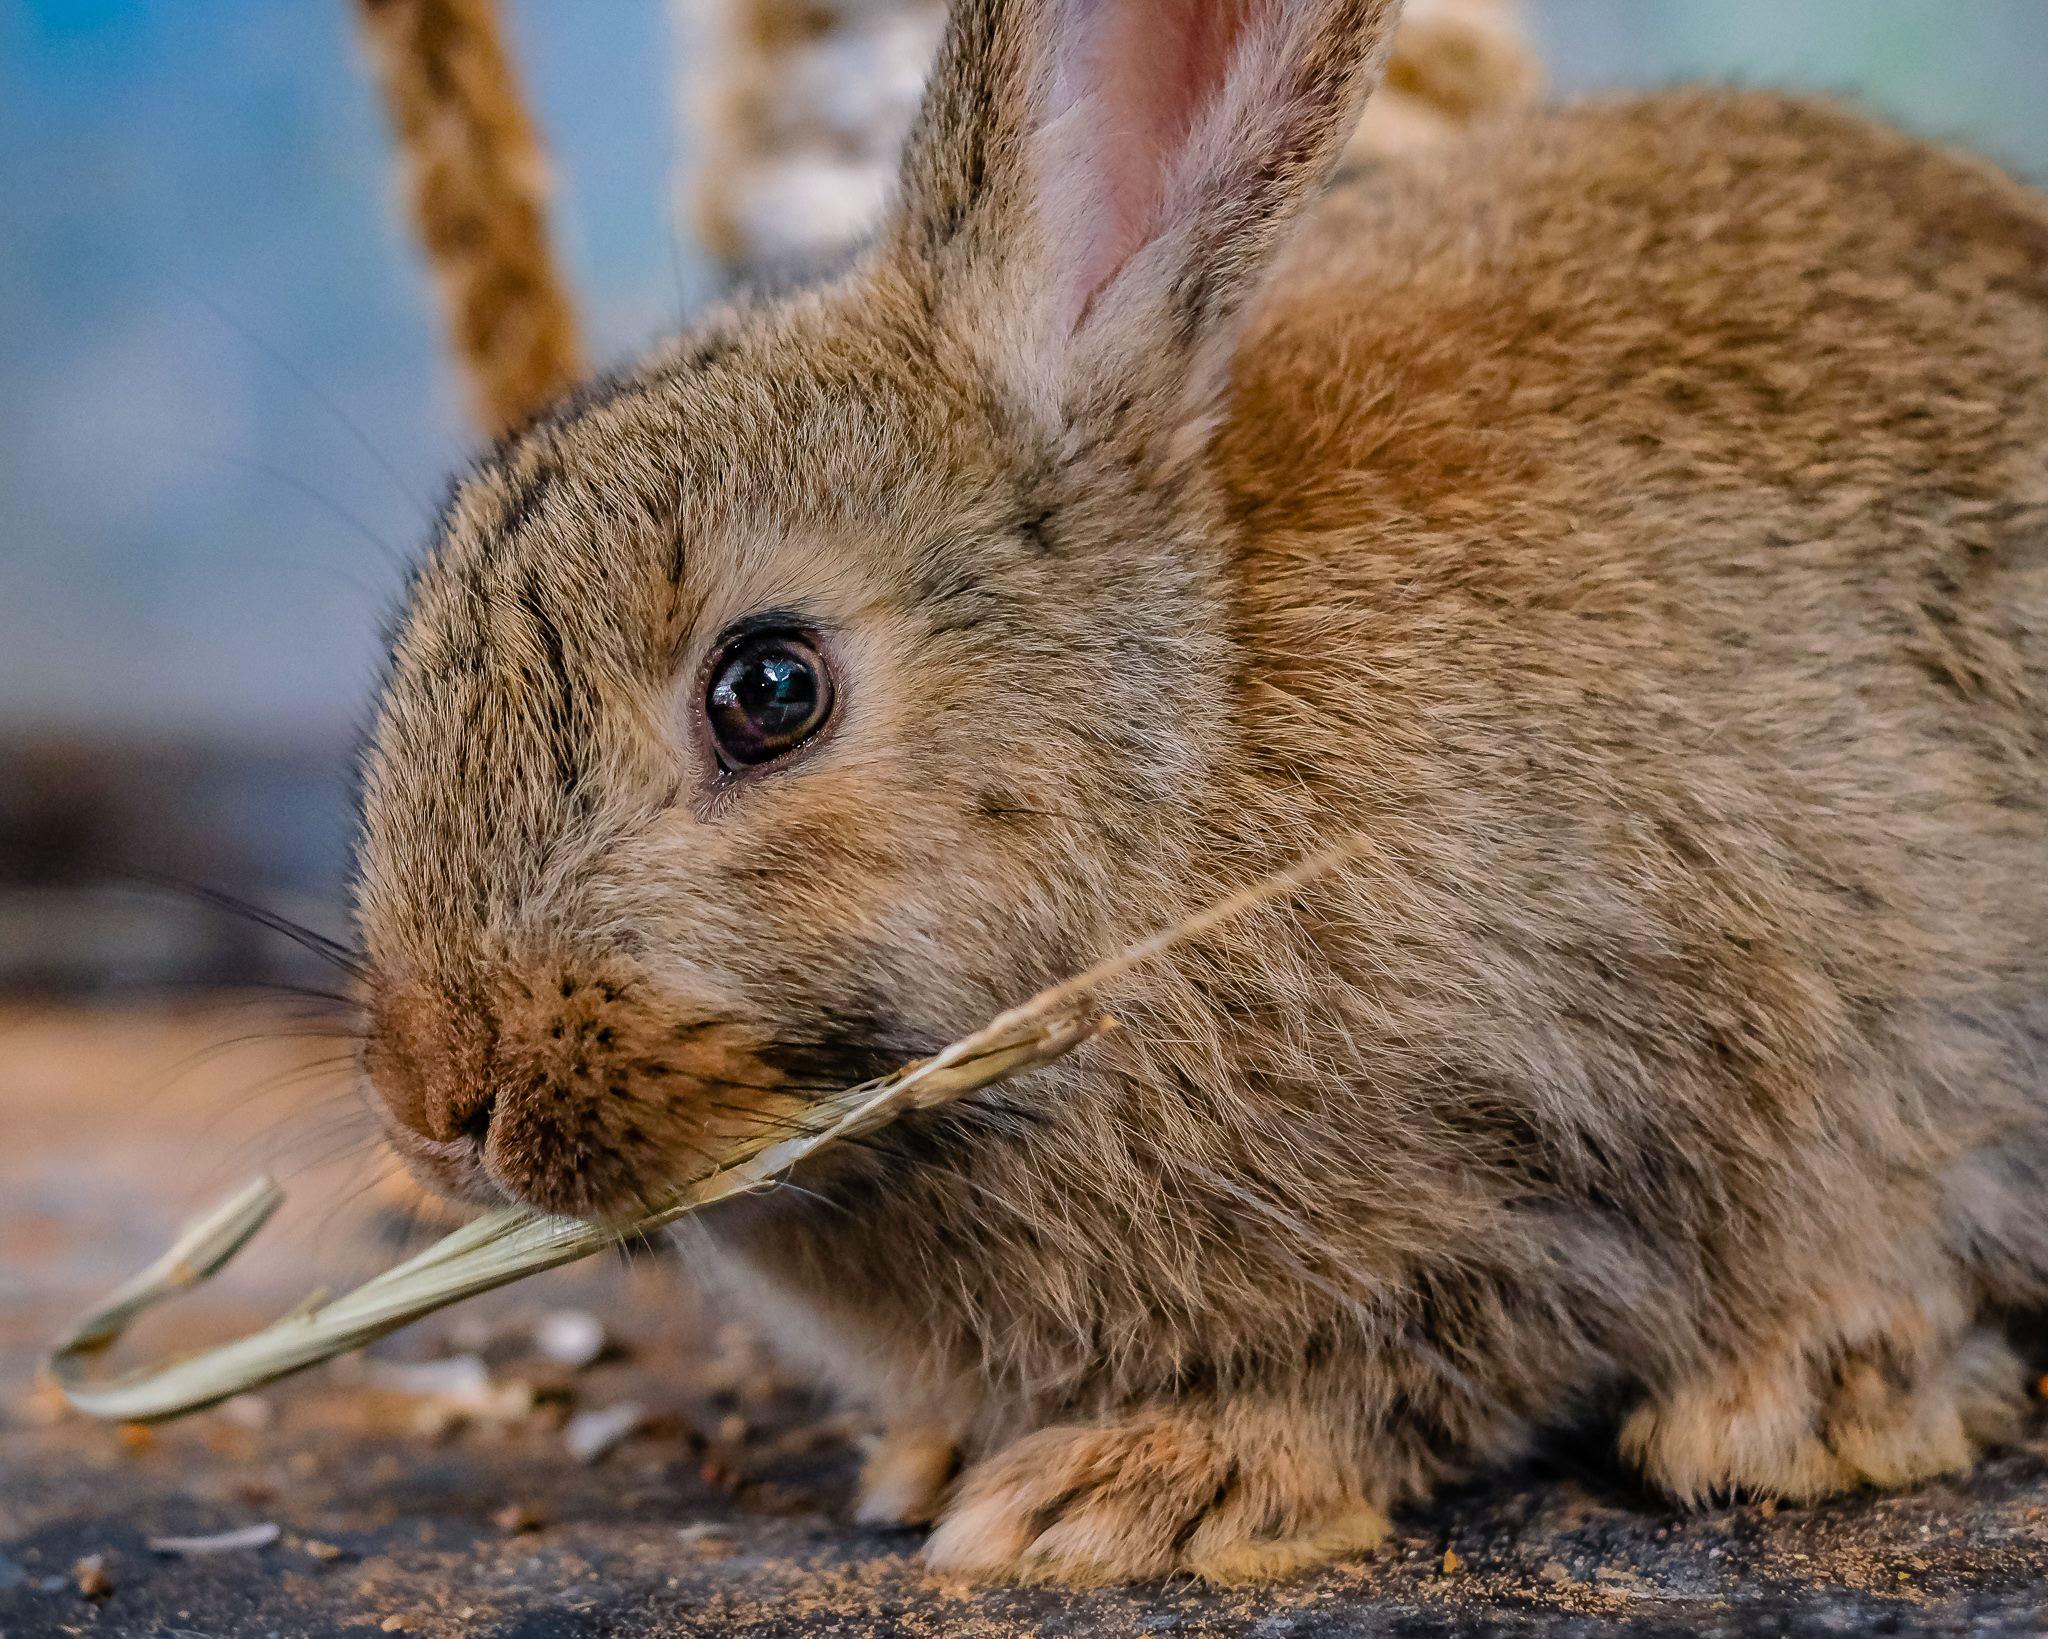 ארנבון